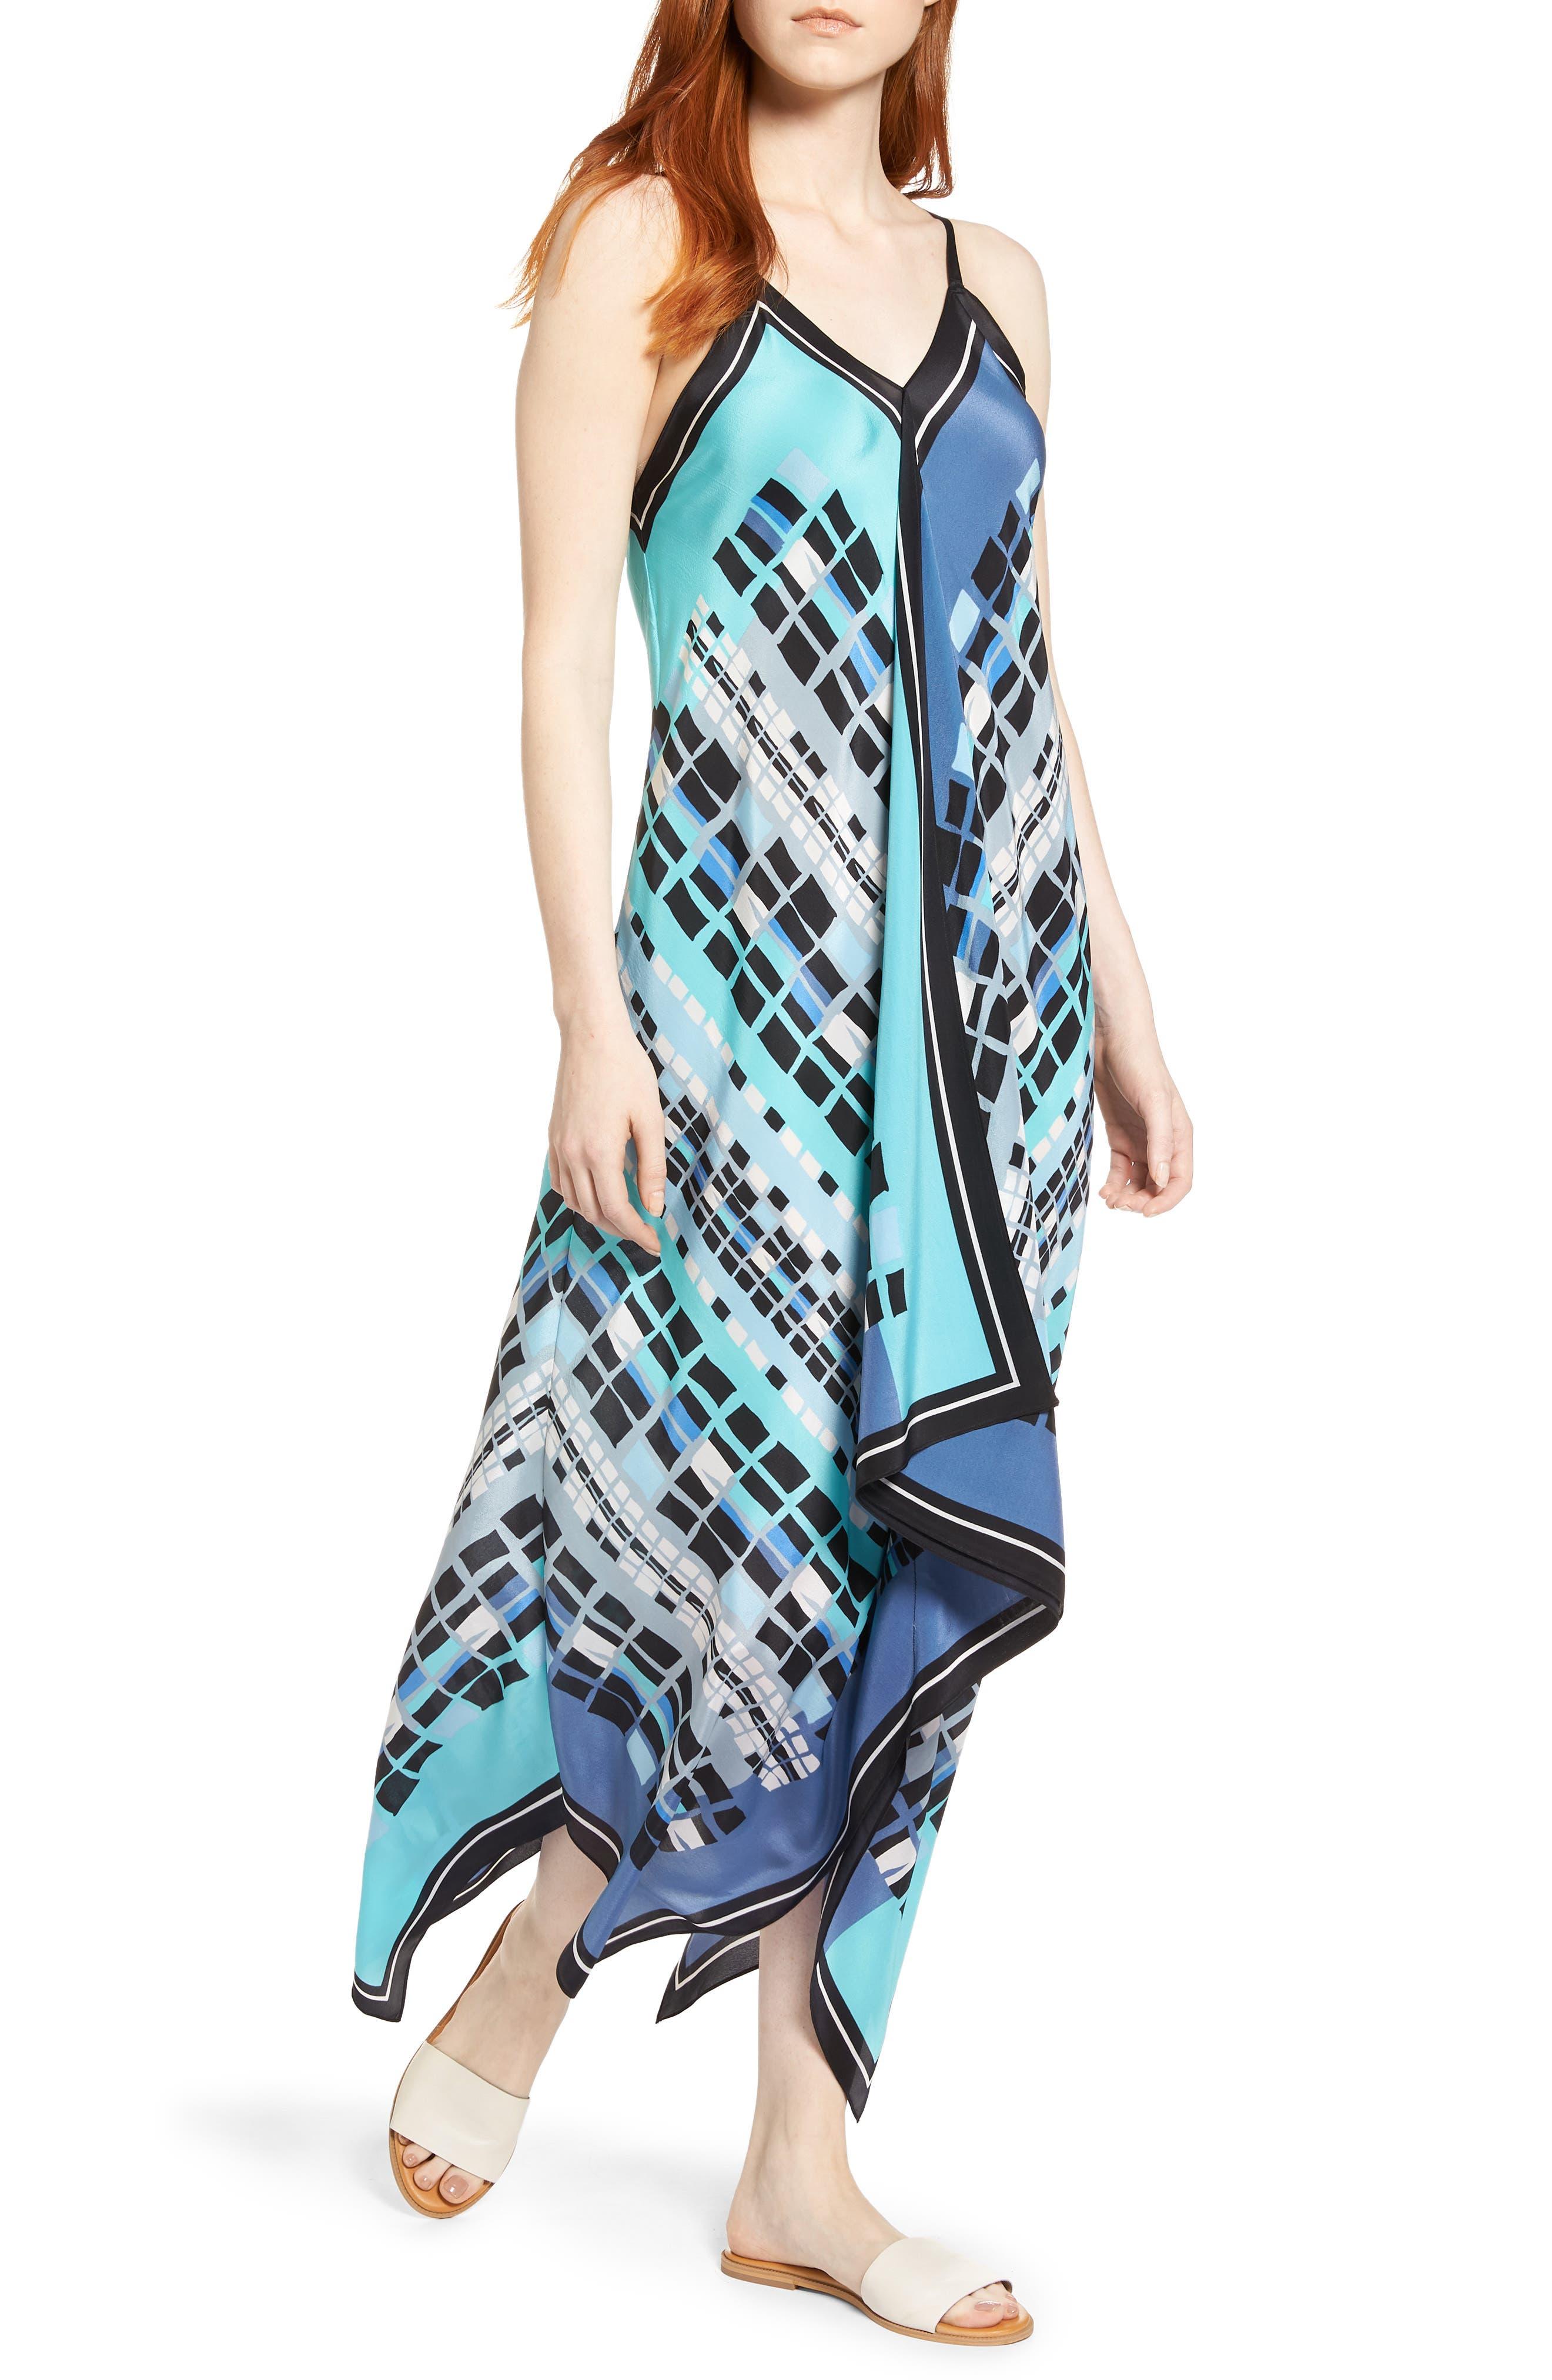 Alternate Image 1 Selected - NIC+ZOE From Above Dress Silk Blend Maxi Dress (Regular & Petite)